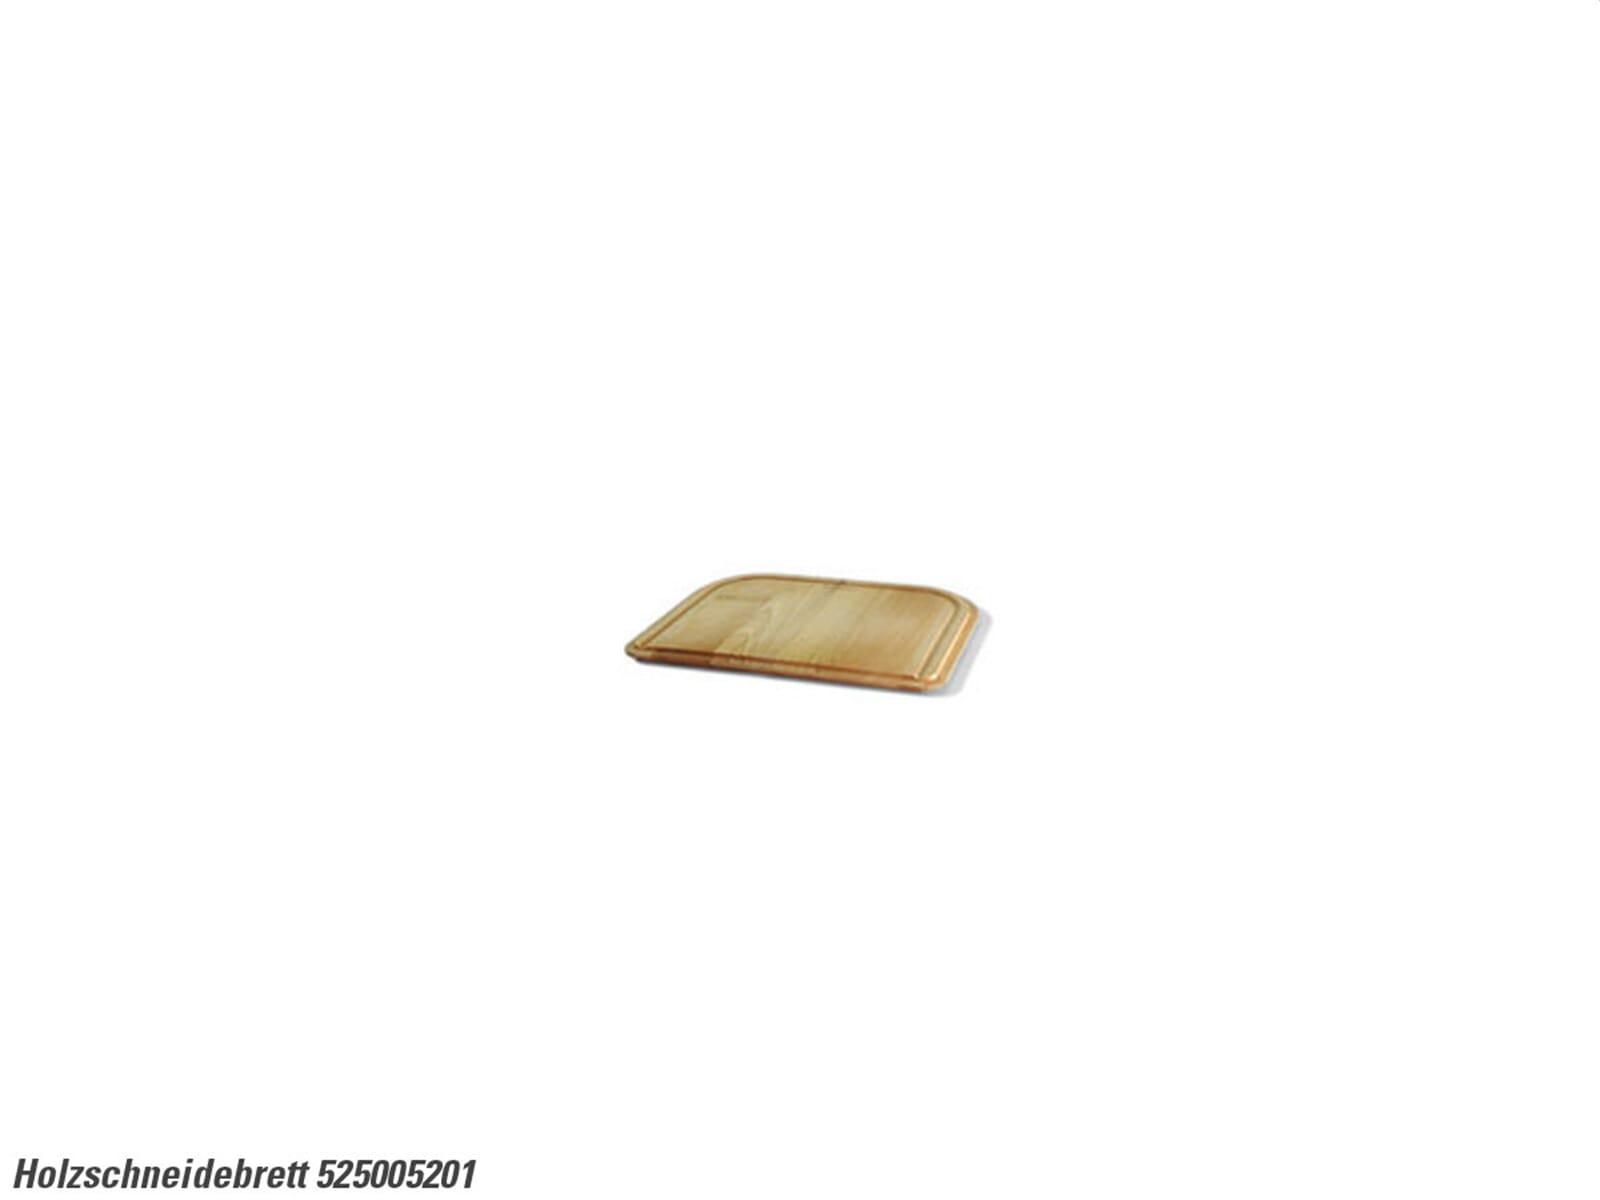 Pyramis 525005201 Holzschneidebrett Buche